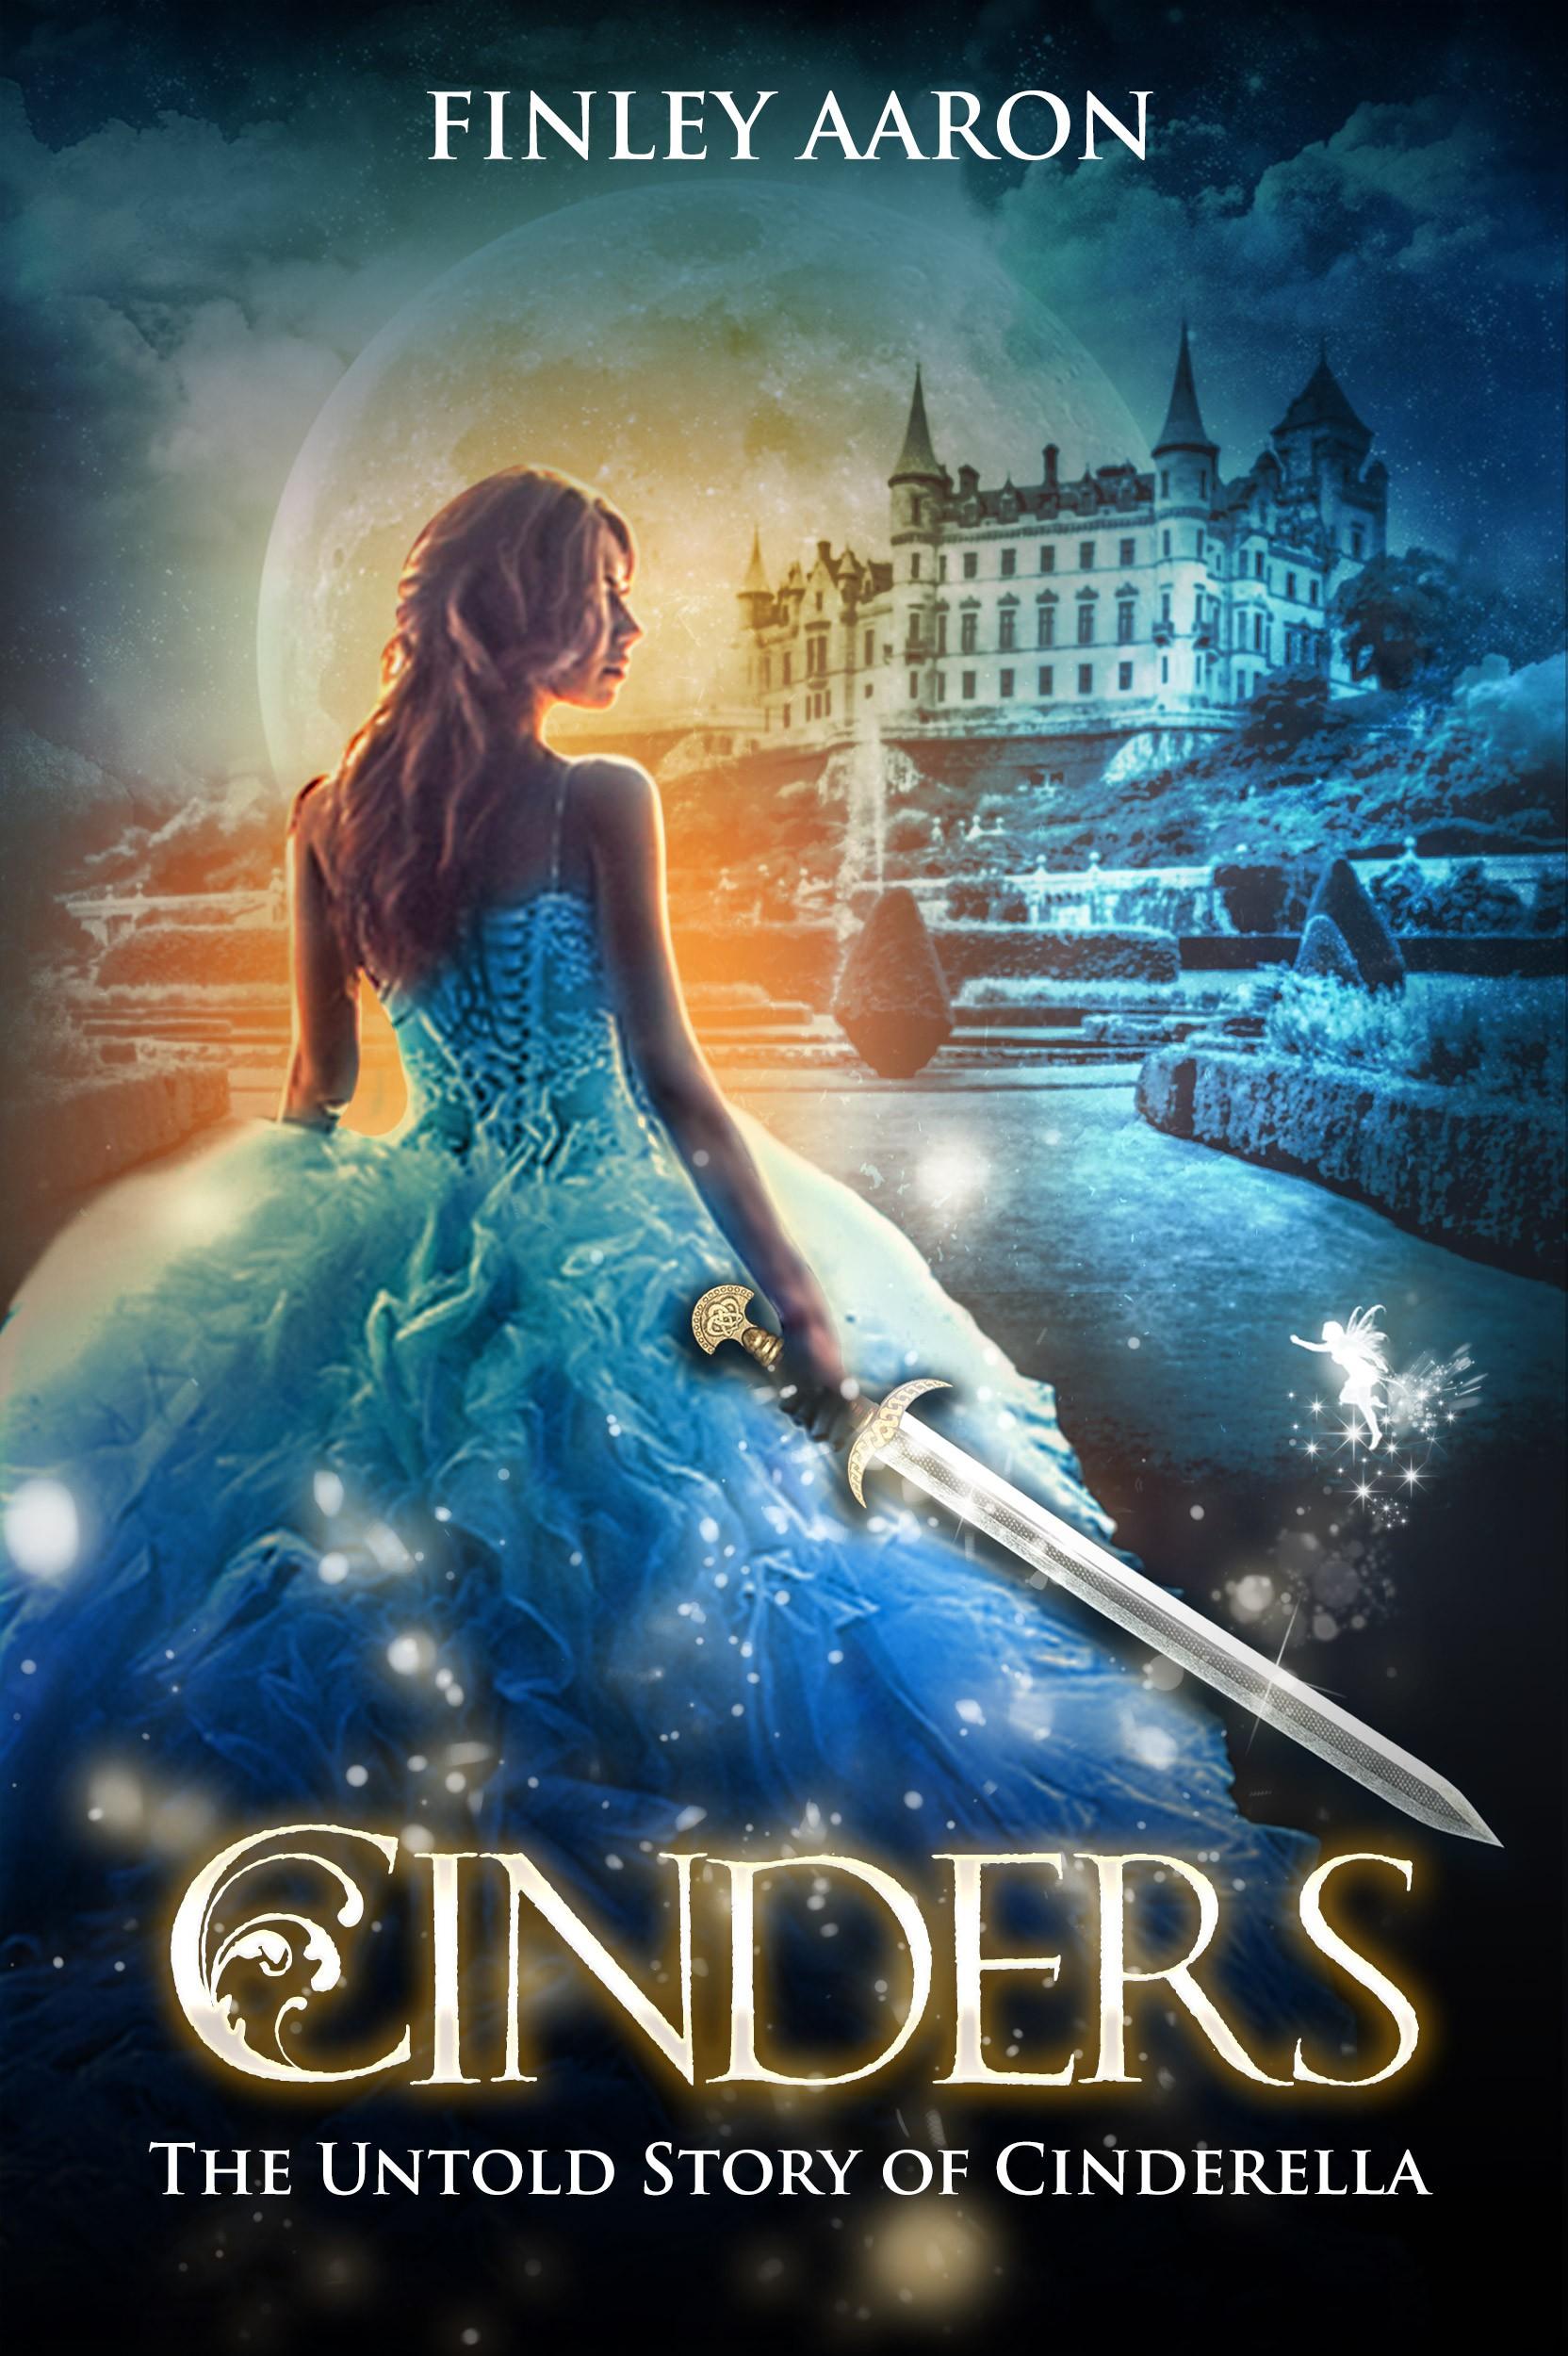 YA book cover Cinderella warrior retelling